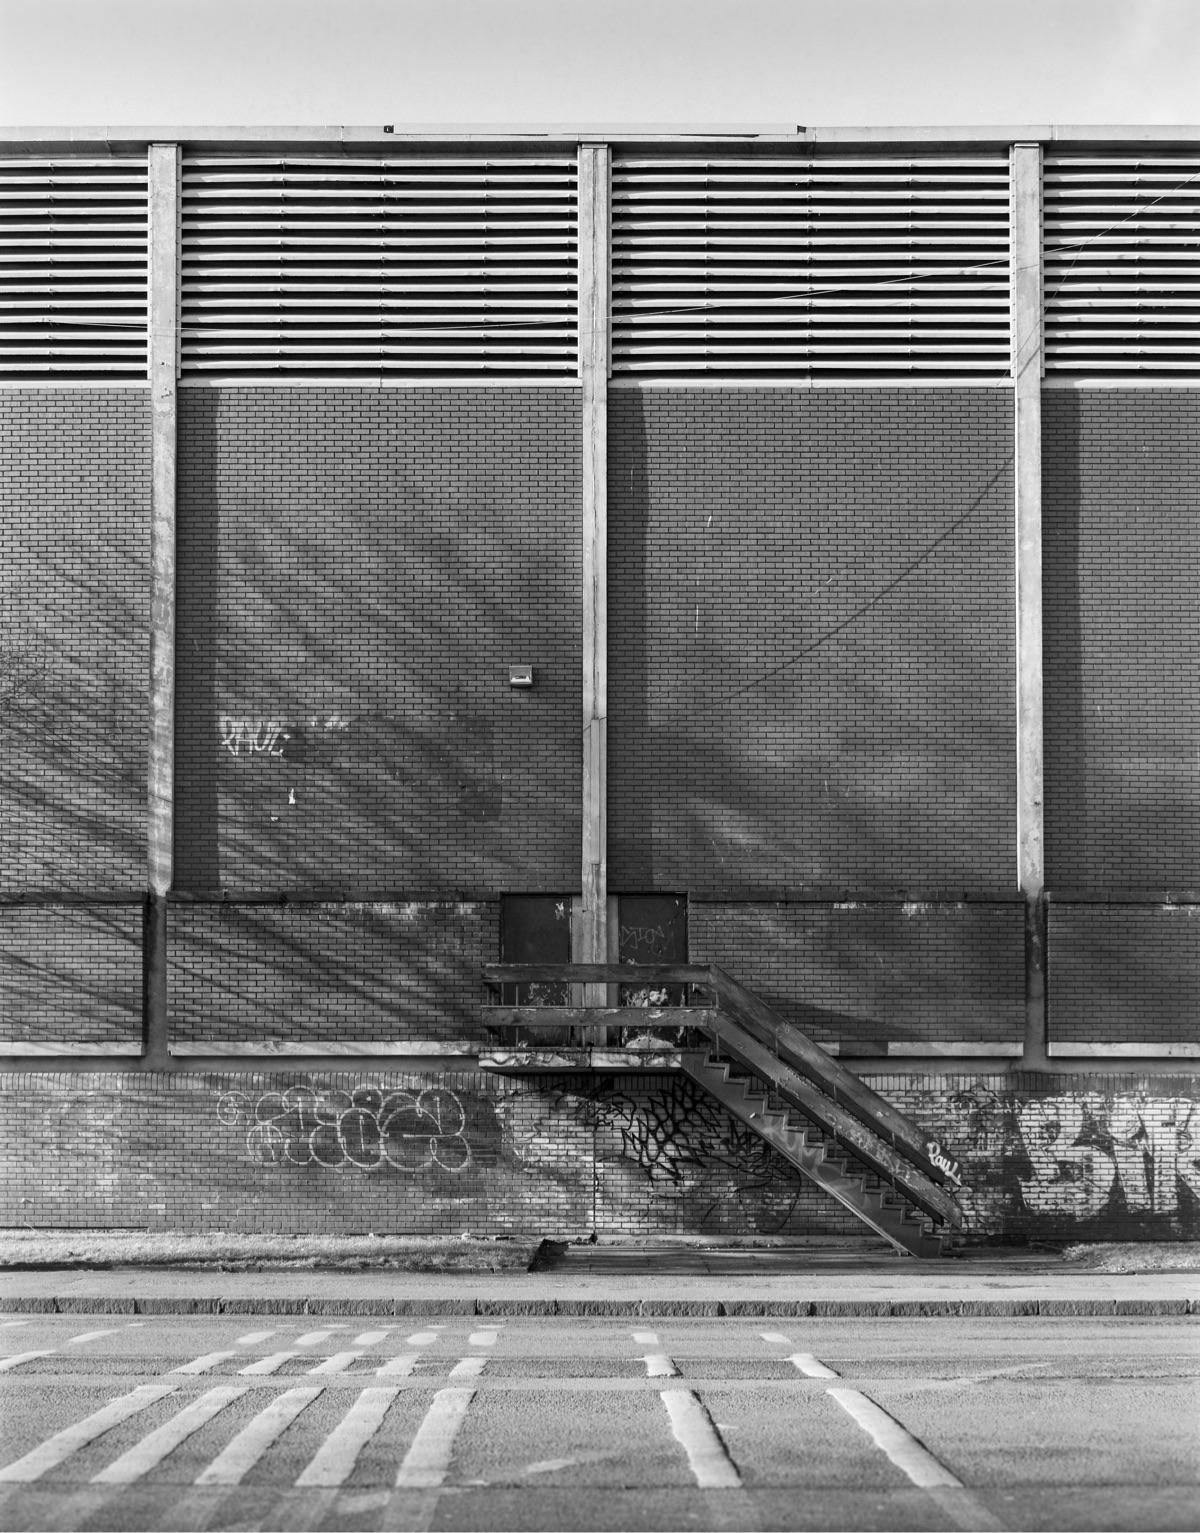 Birmingham, UK 2018 - england, architecture - acarrphoto | ello